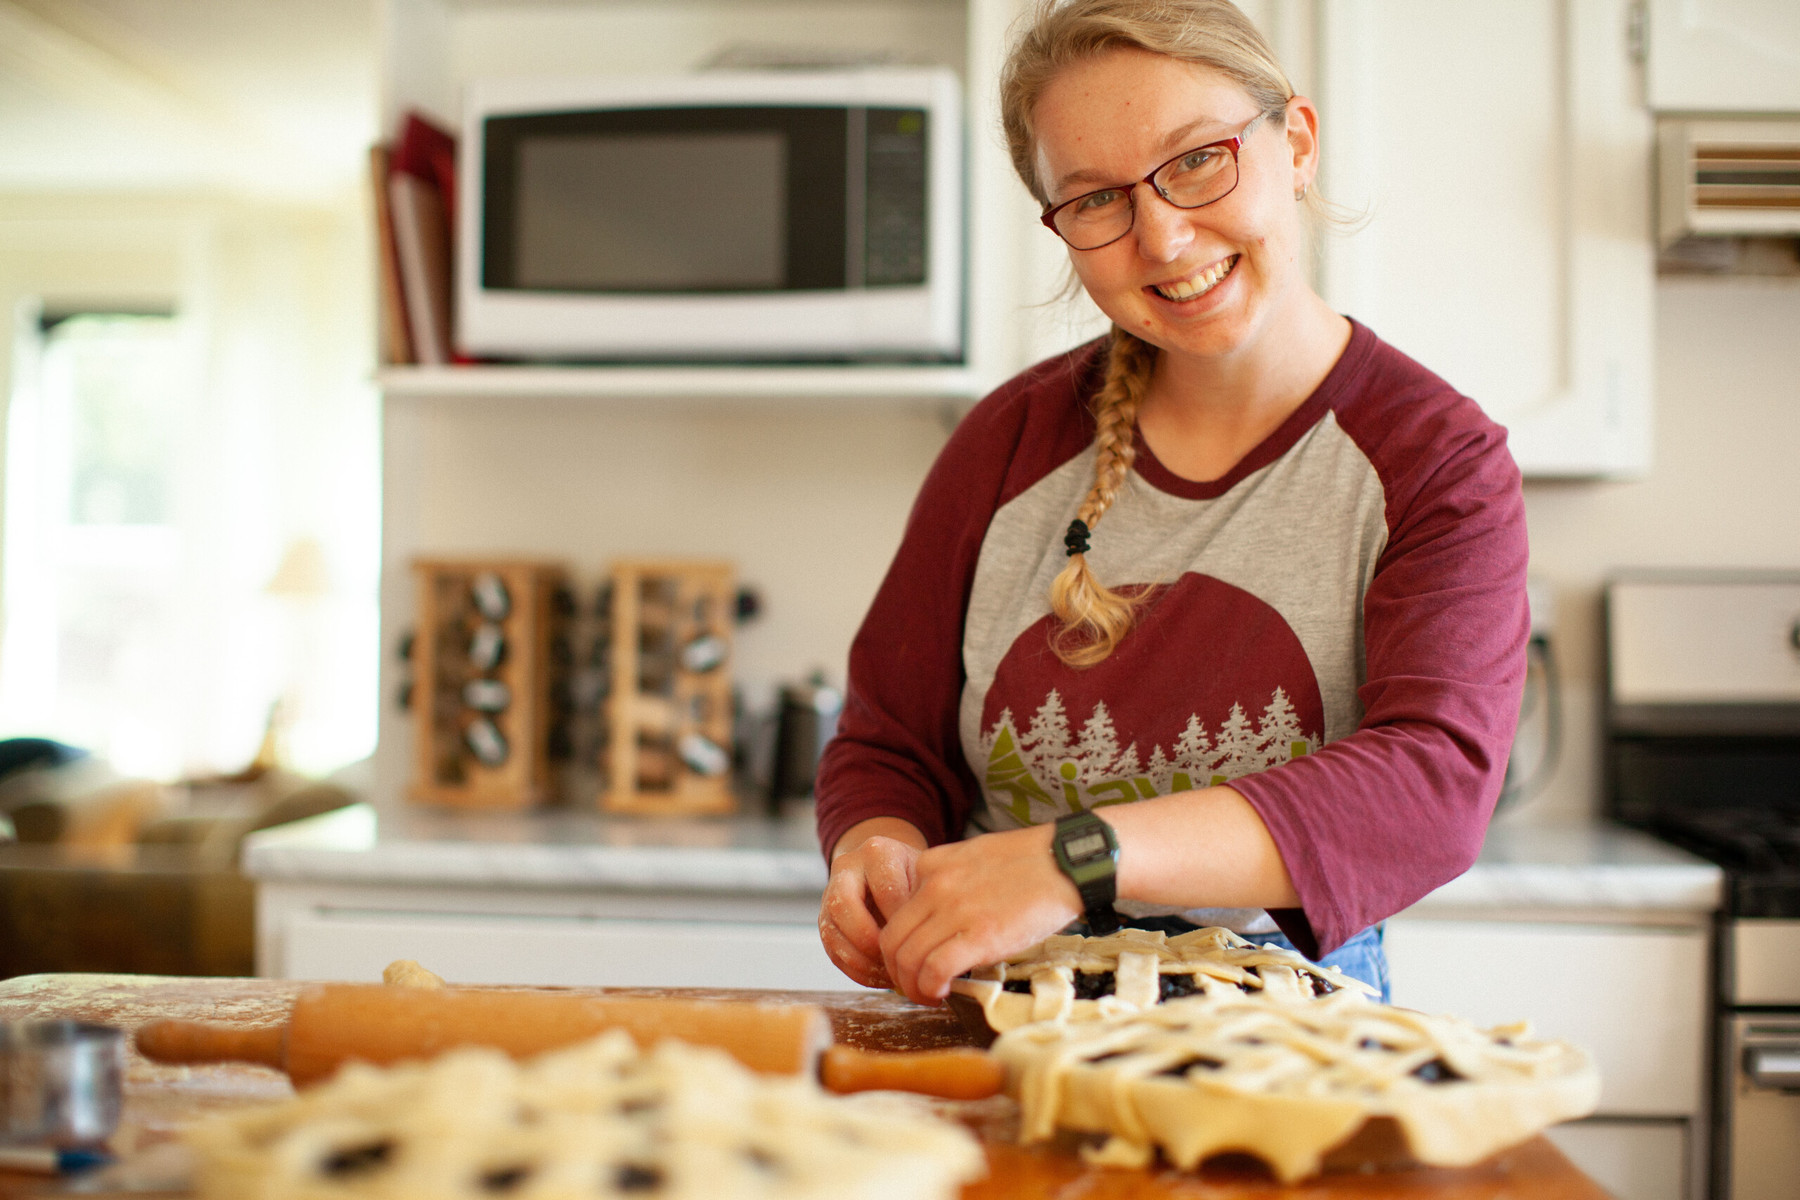 Laura Naftel baking pies